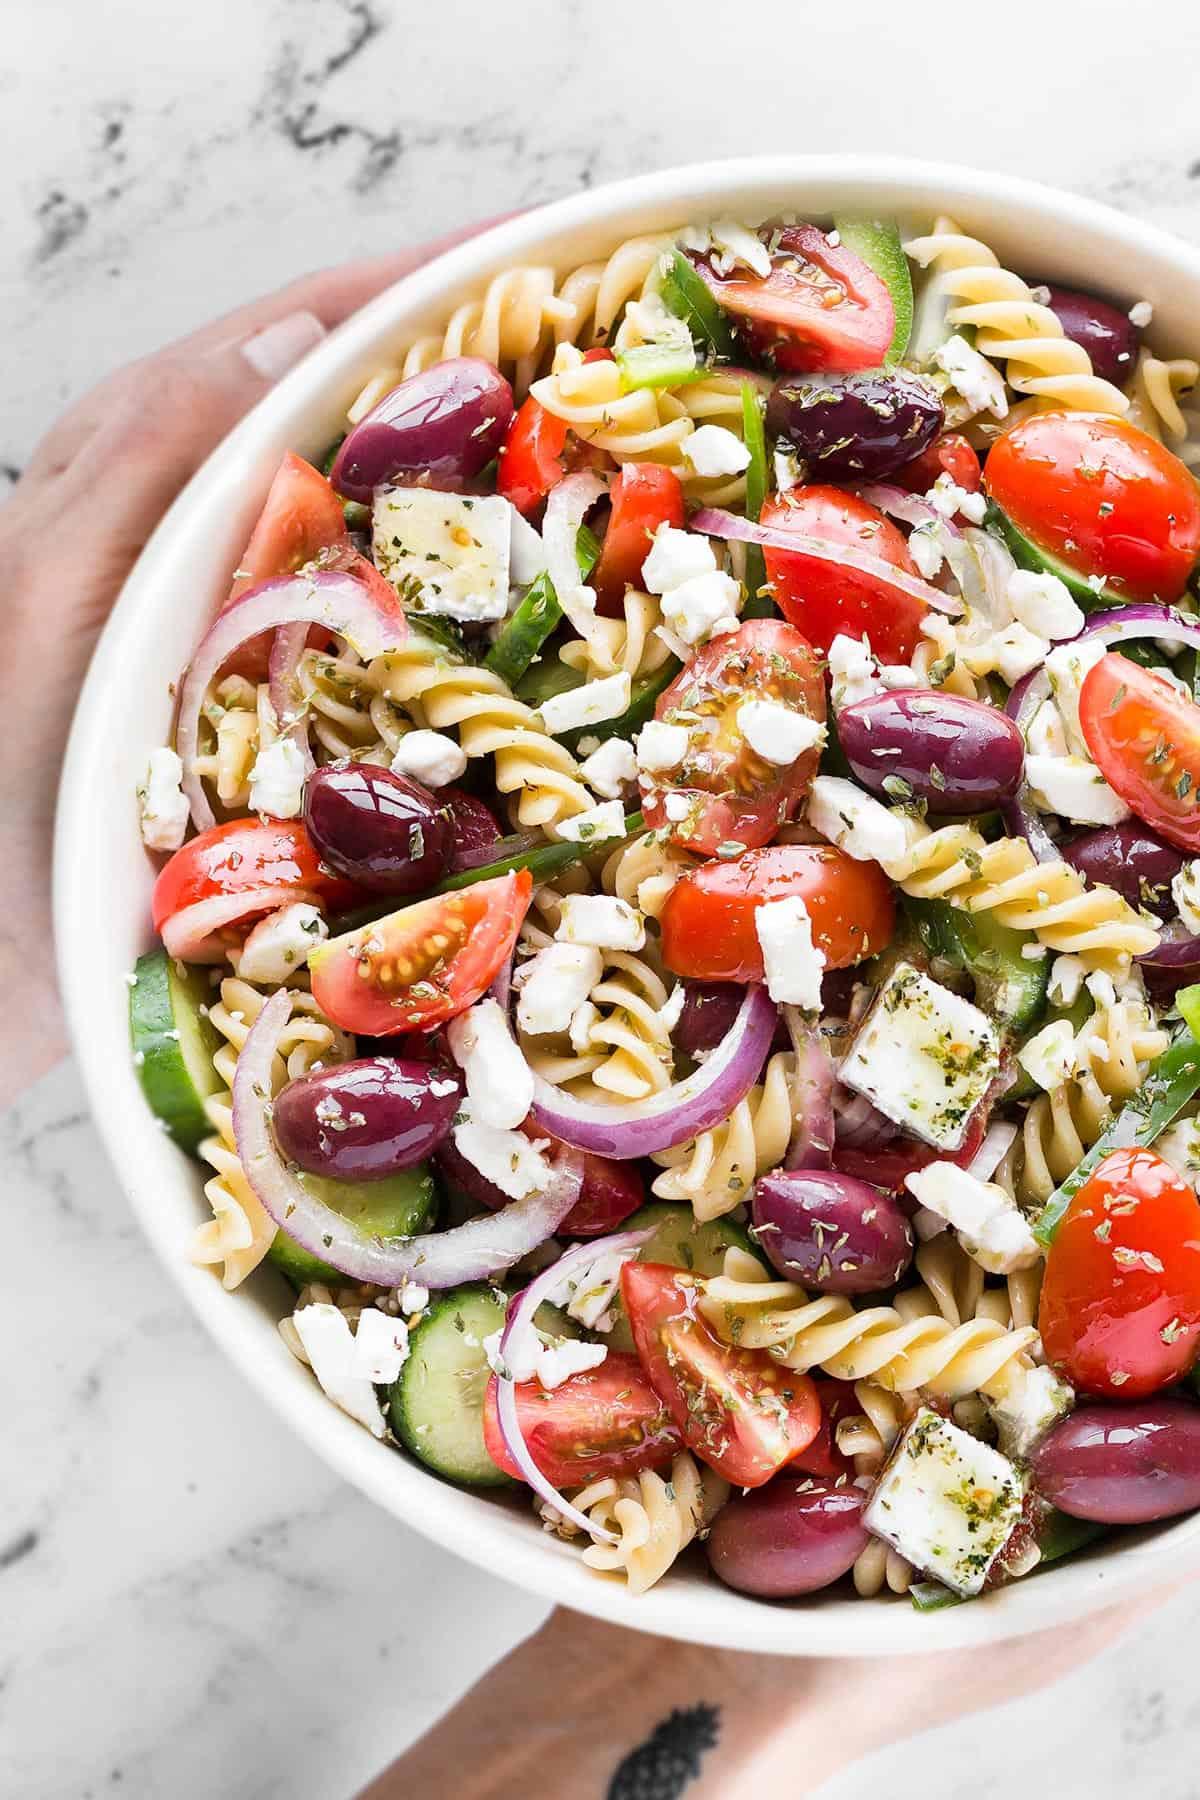 Hands holding a bowl of Greek pasta salad